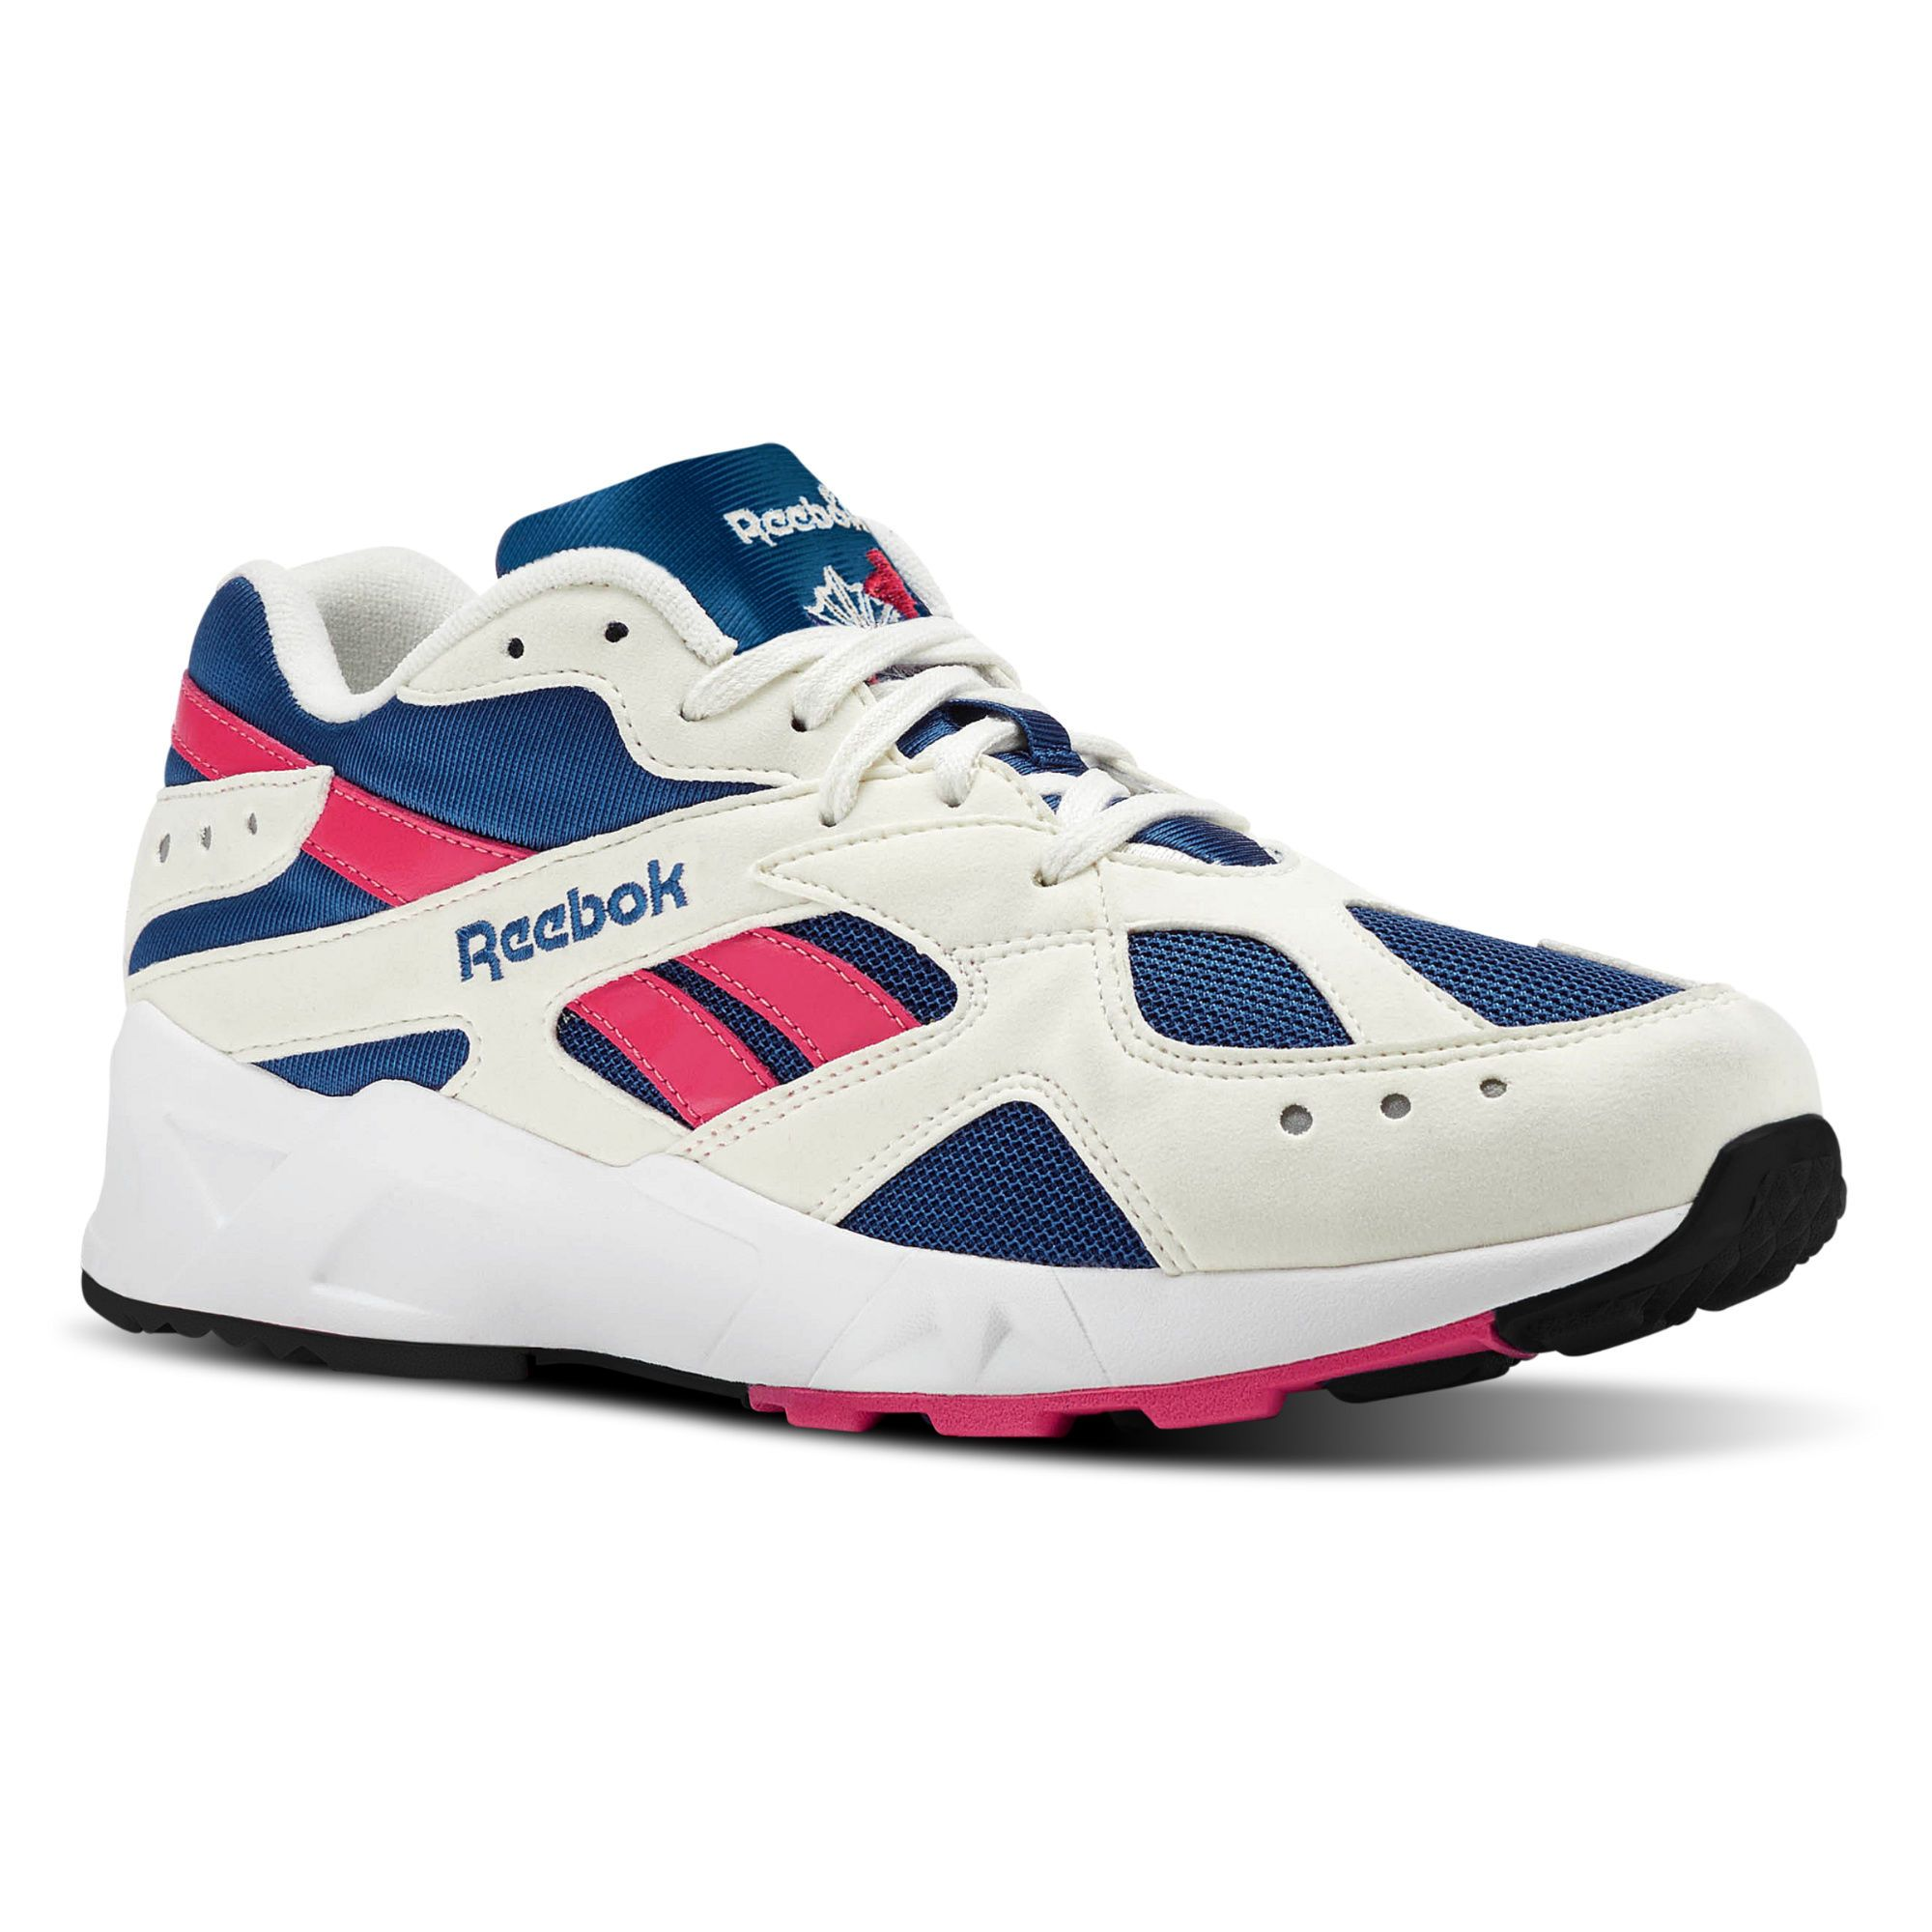 metodología detergente acumular  Reebok Aztrek Shoes - White | Reebok US | White reebok, Retro running  shoes, Reebok